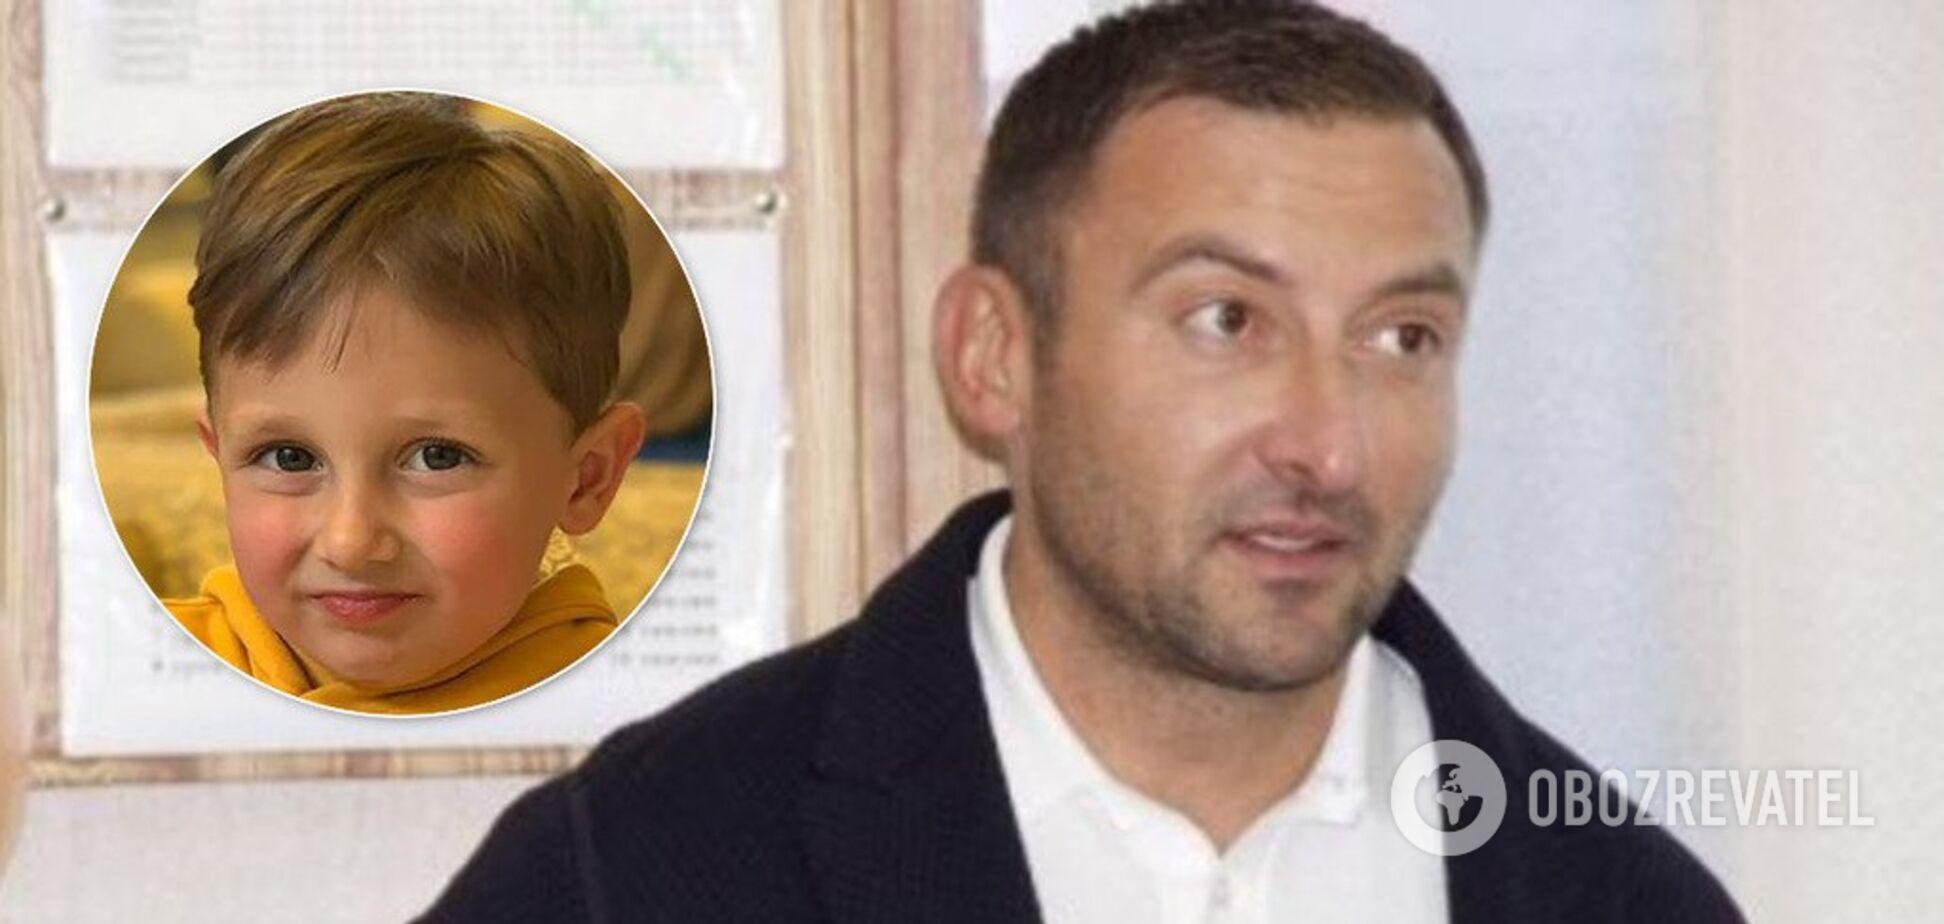 В Киеве во время покушения на депутата убили ребенка